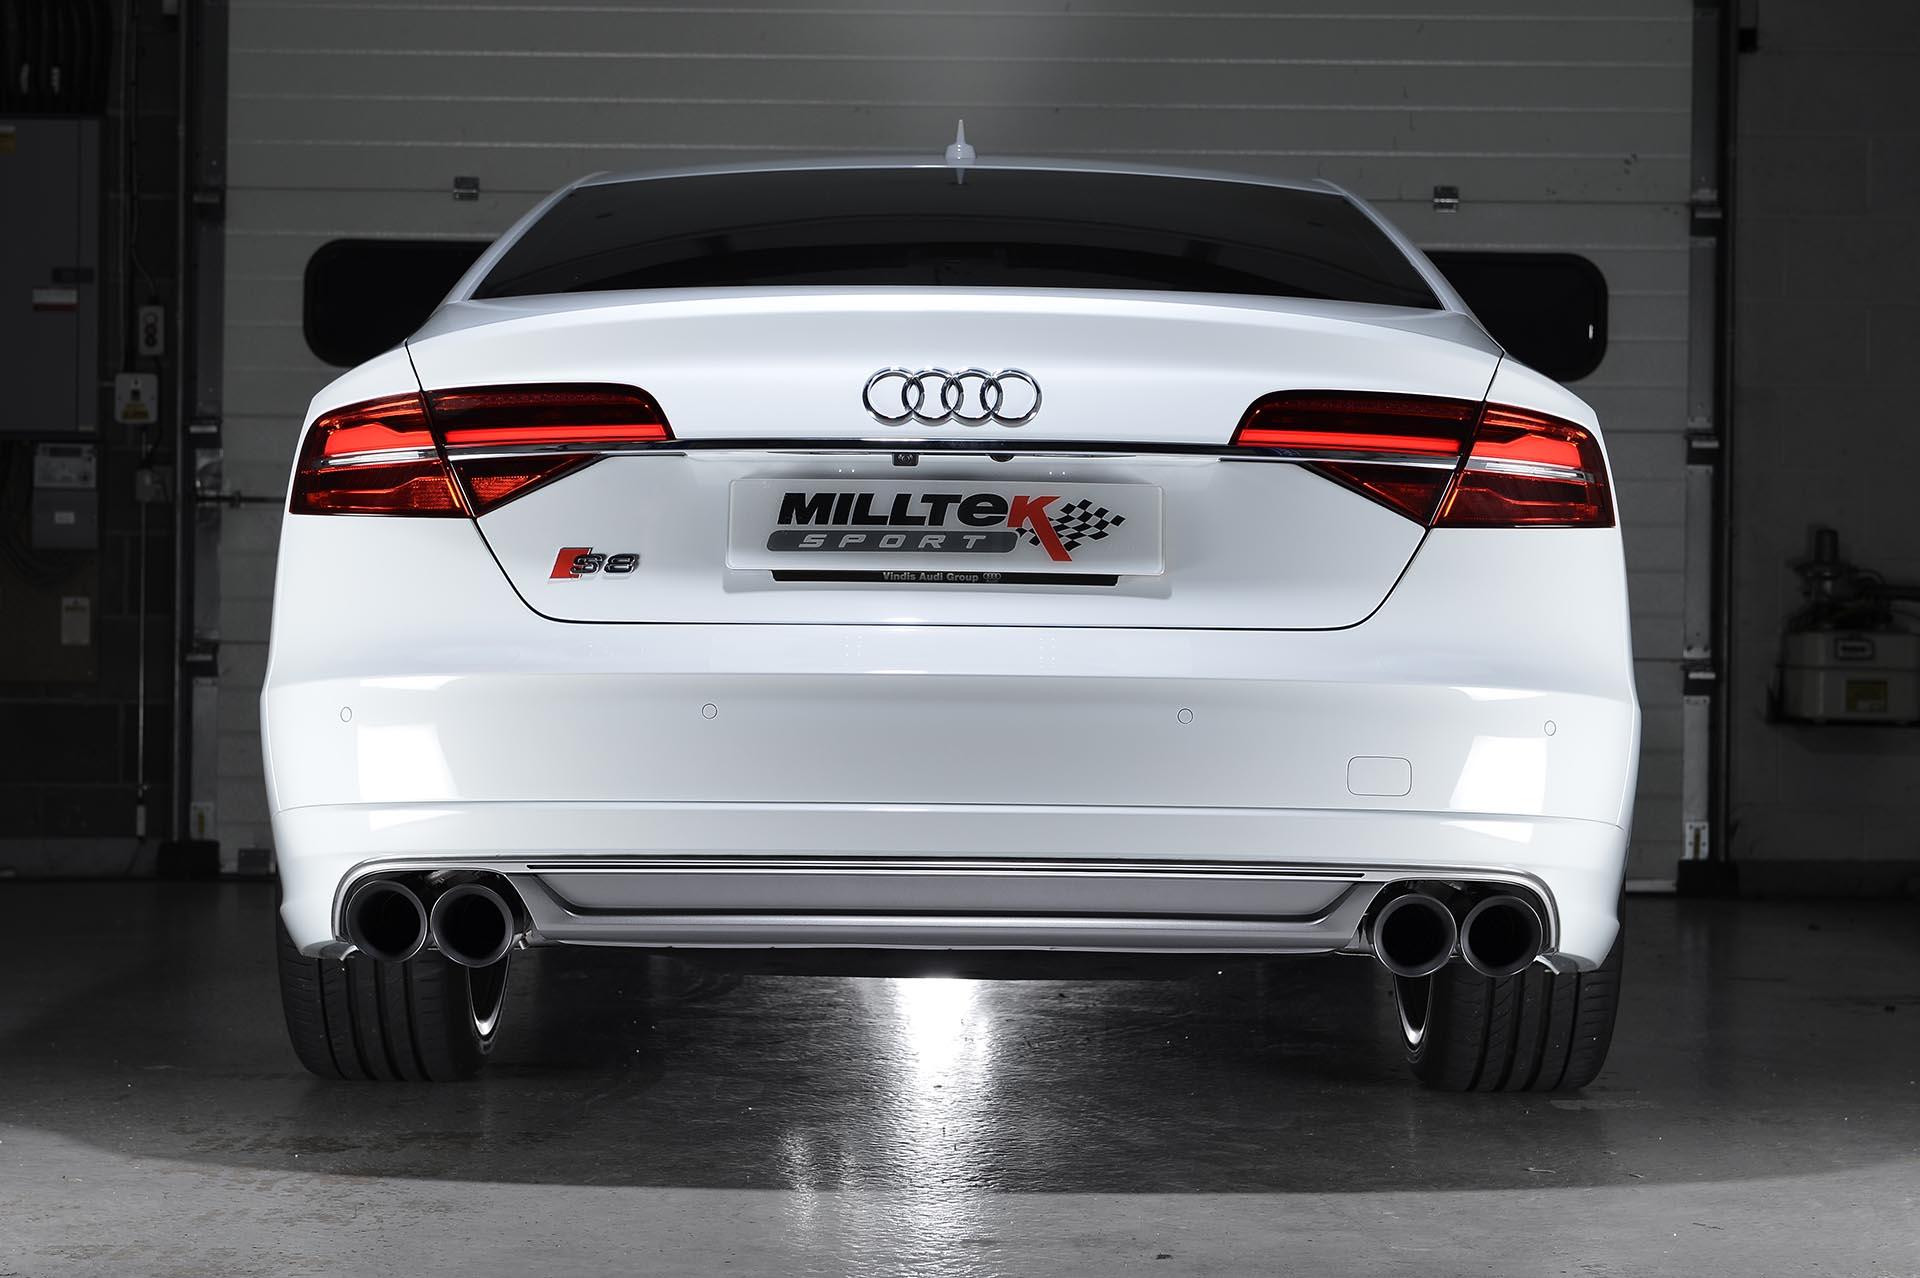 Millteksport(ミルテックスポーツ) Audi S8 株式会社 アルファライン